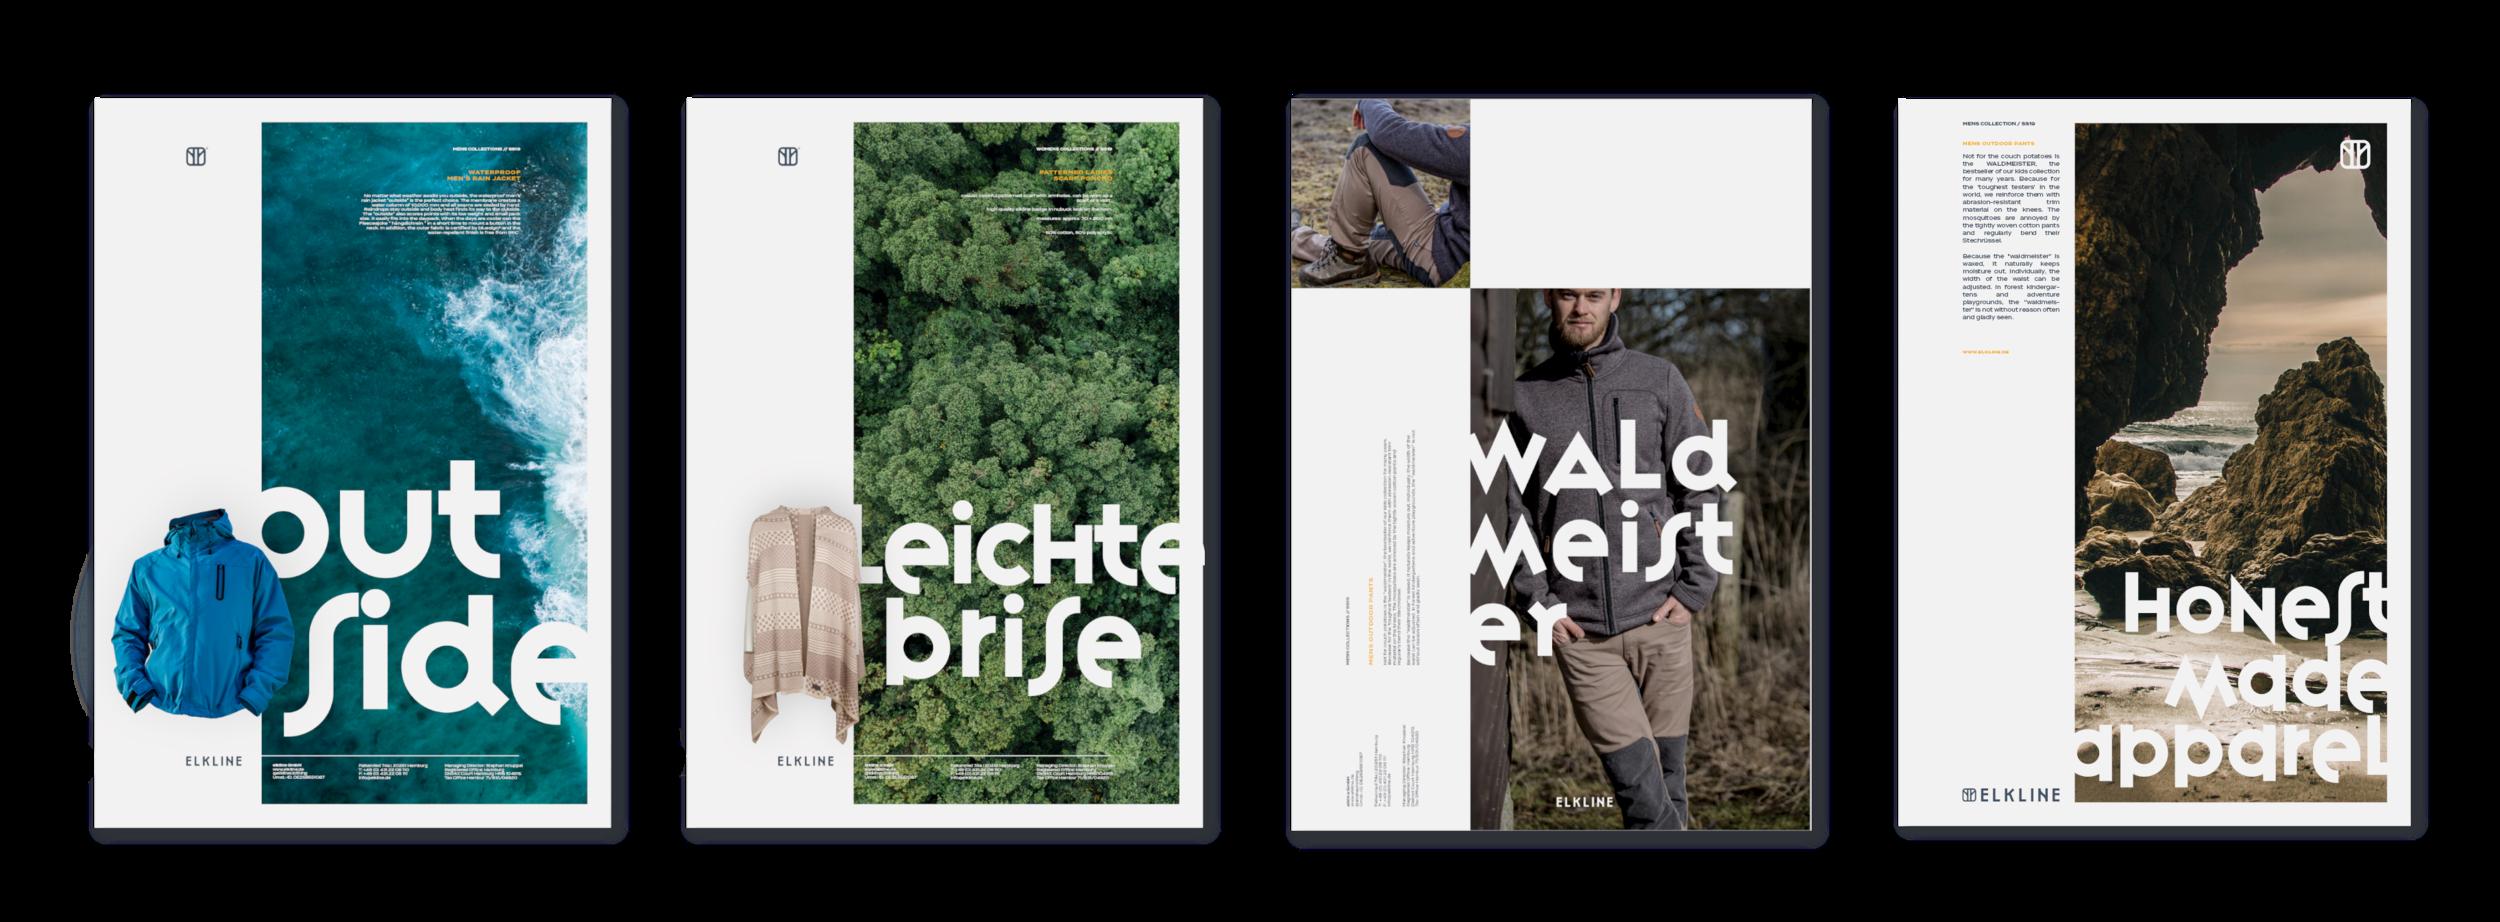 ELKLINE, Outdoor Fashion Apparel Brand, Advertisement Design and Layout